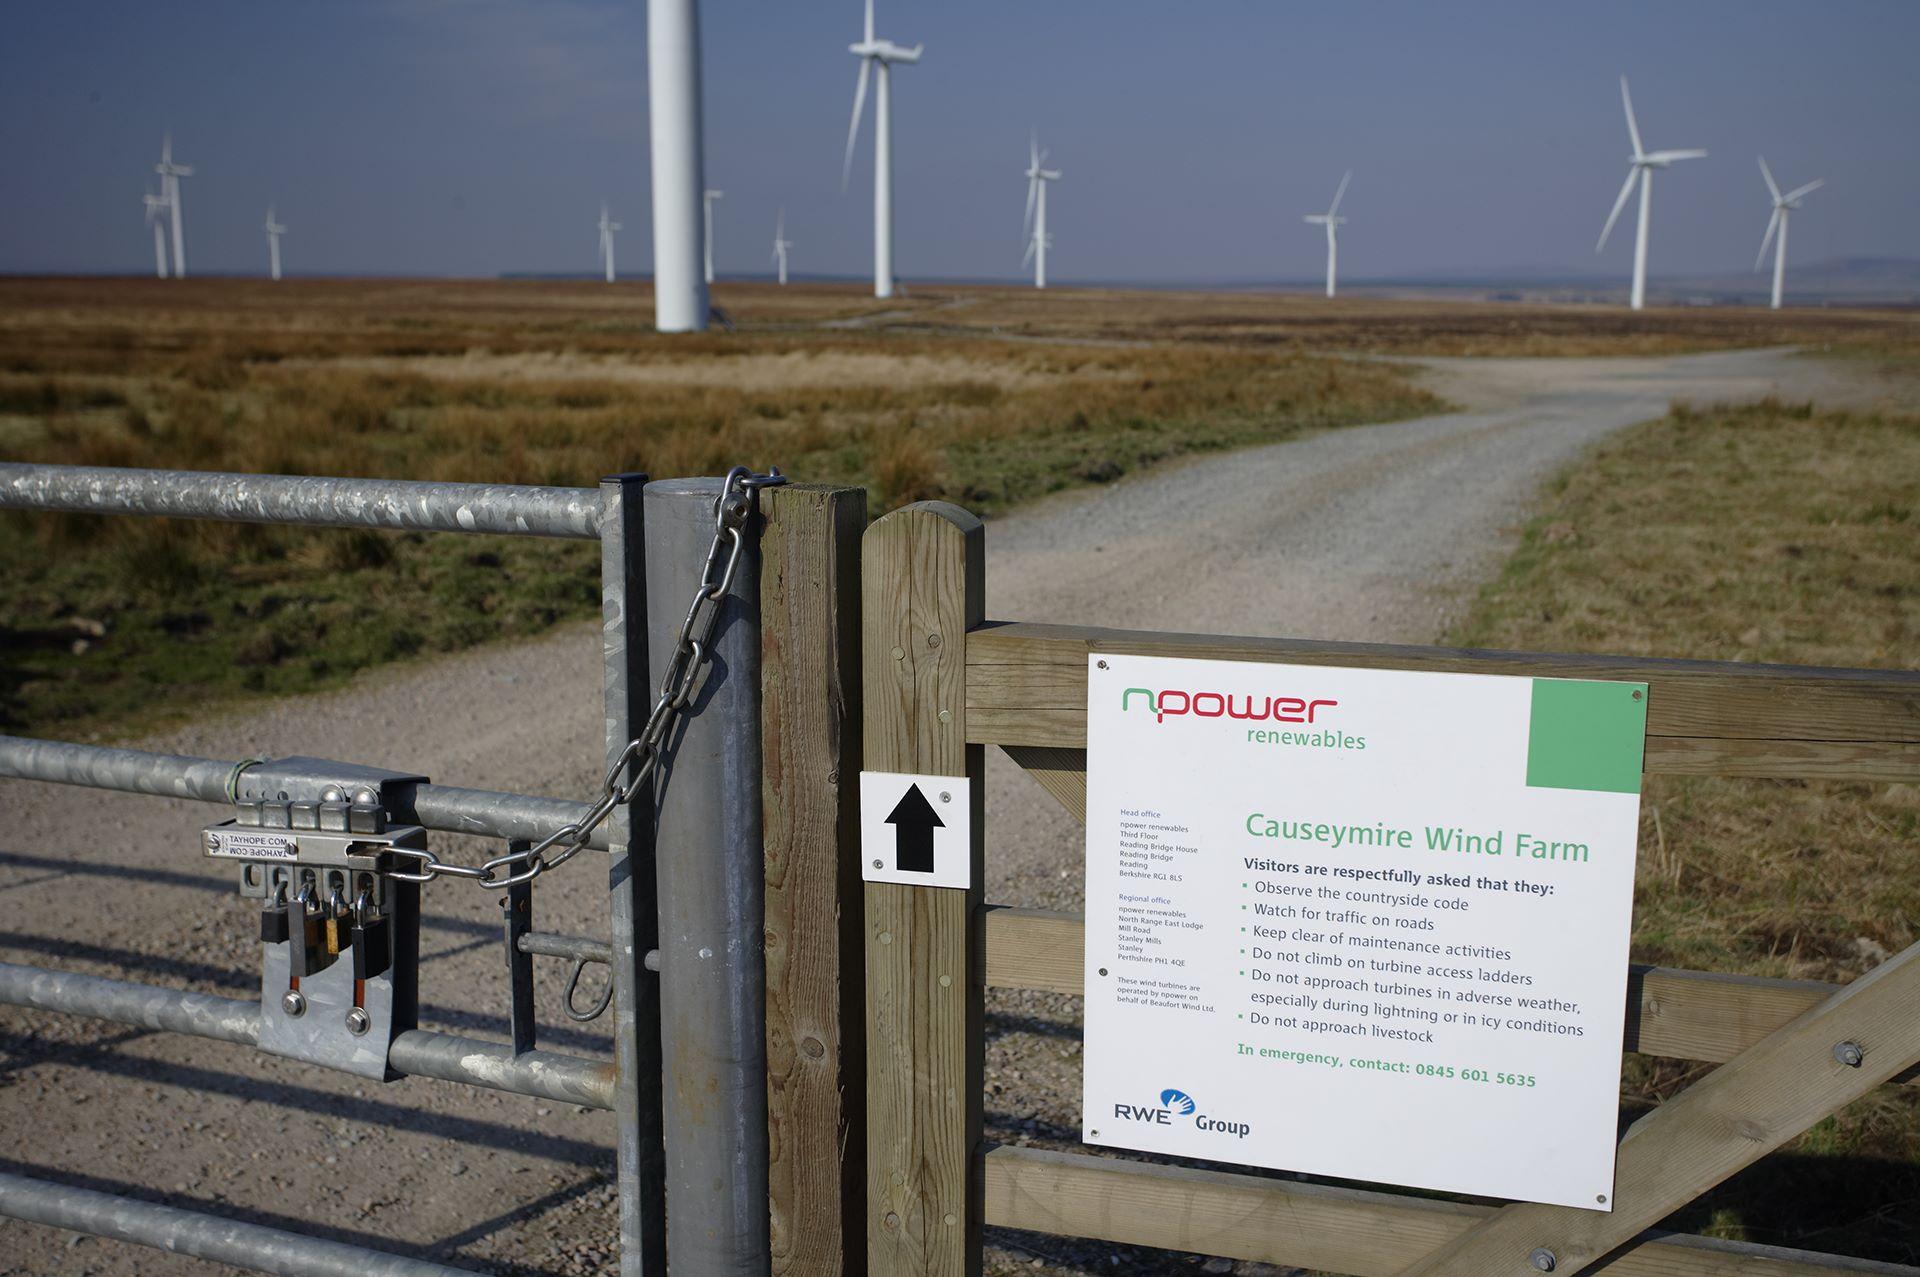 Causeymire Wind Farm, Caithness, Scotland.